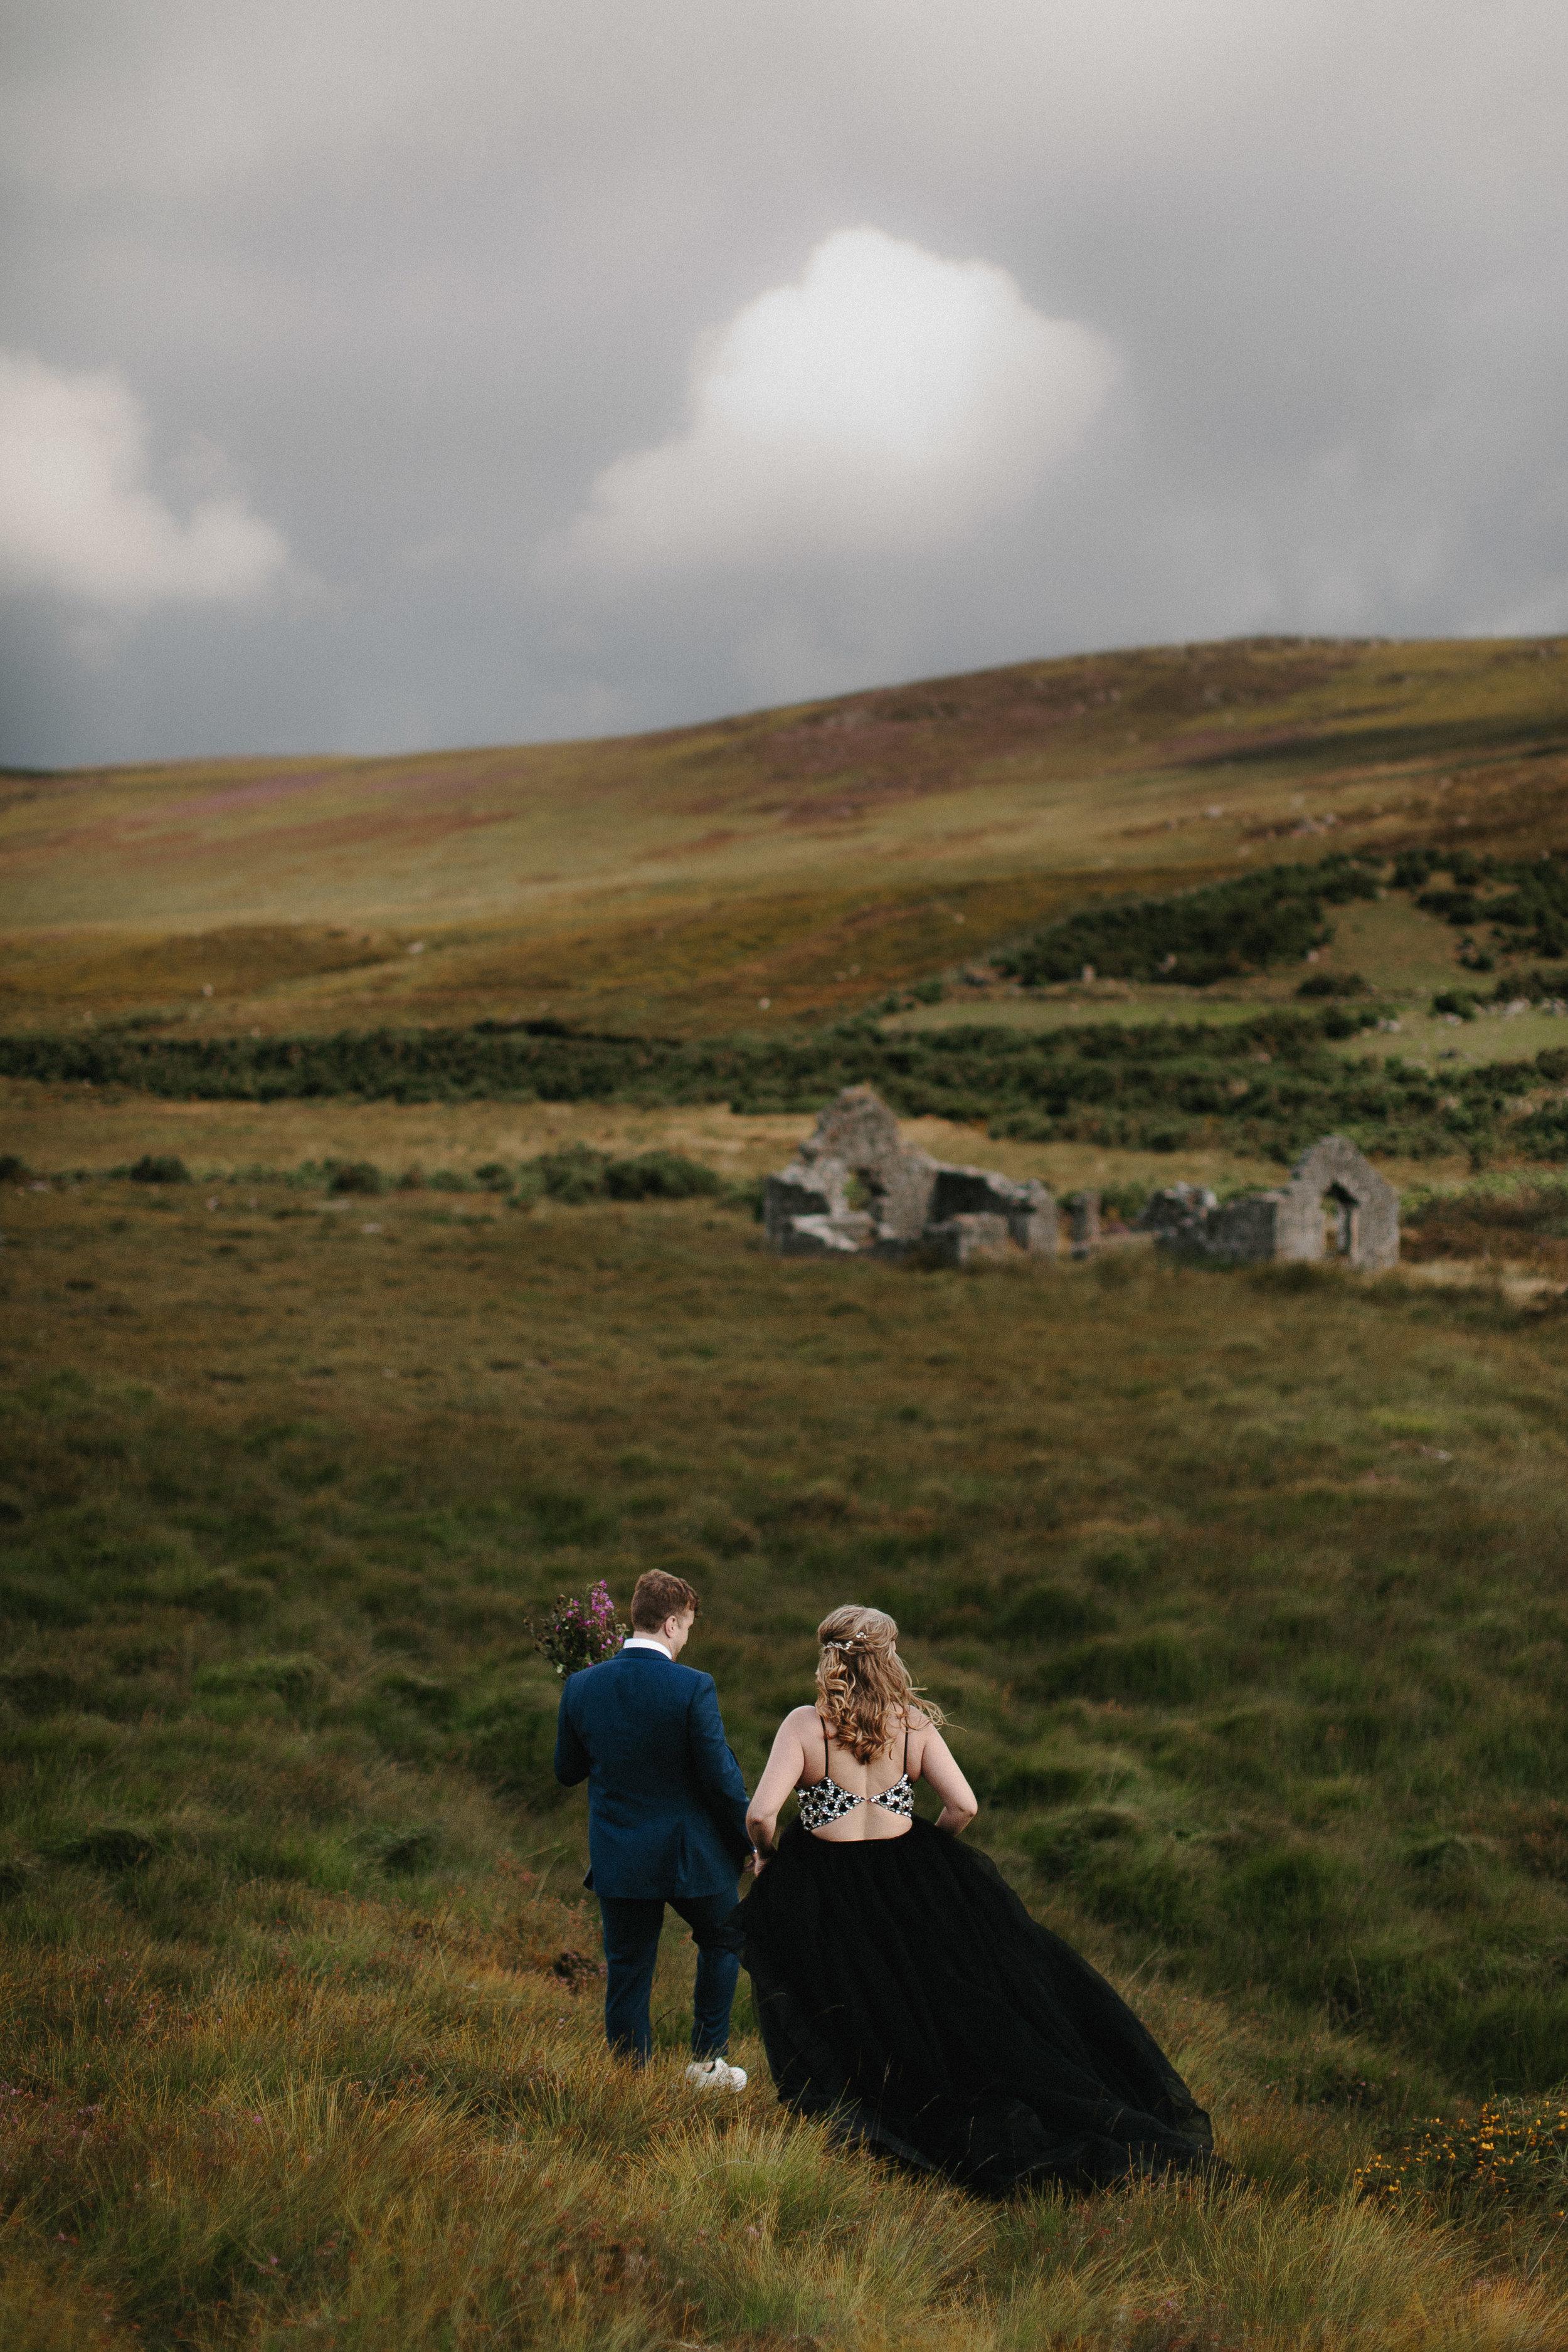 ireland_elopement_black_wedding_dress_wicklow_glendalough_athy_st_kevins_way_1319.jpg